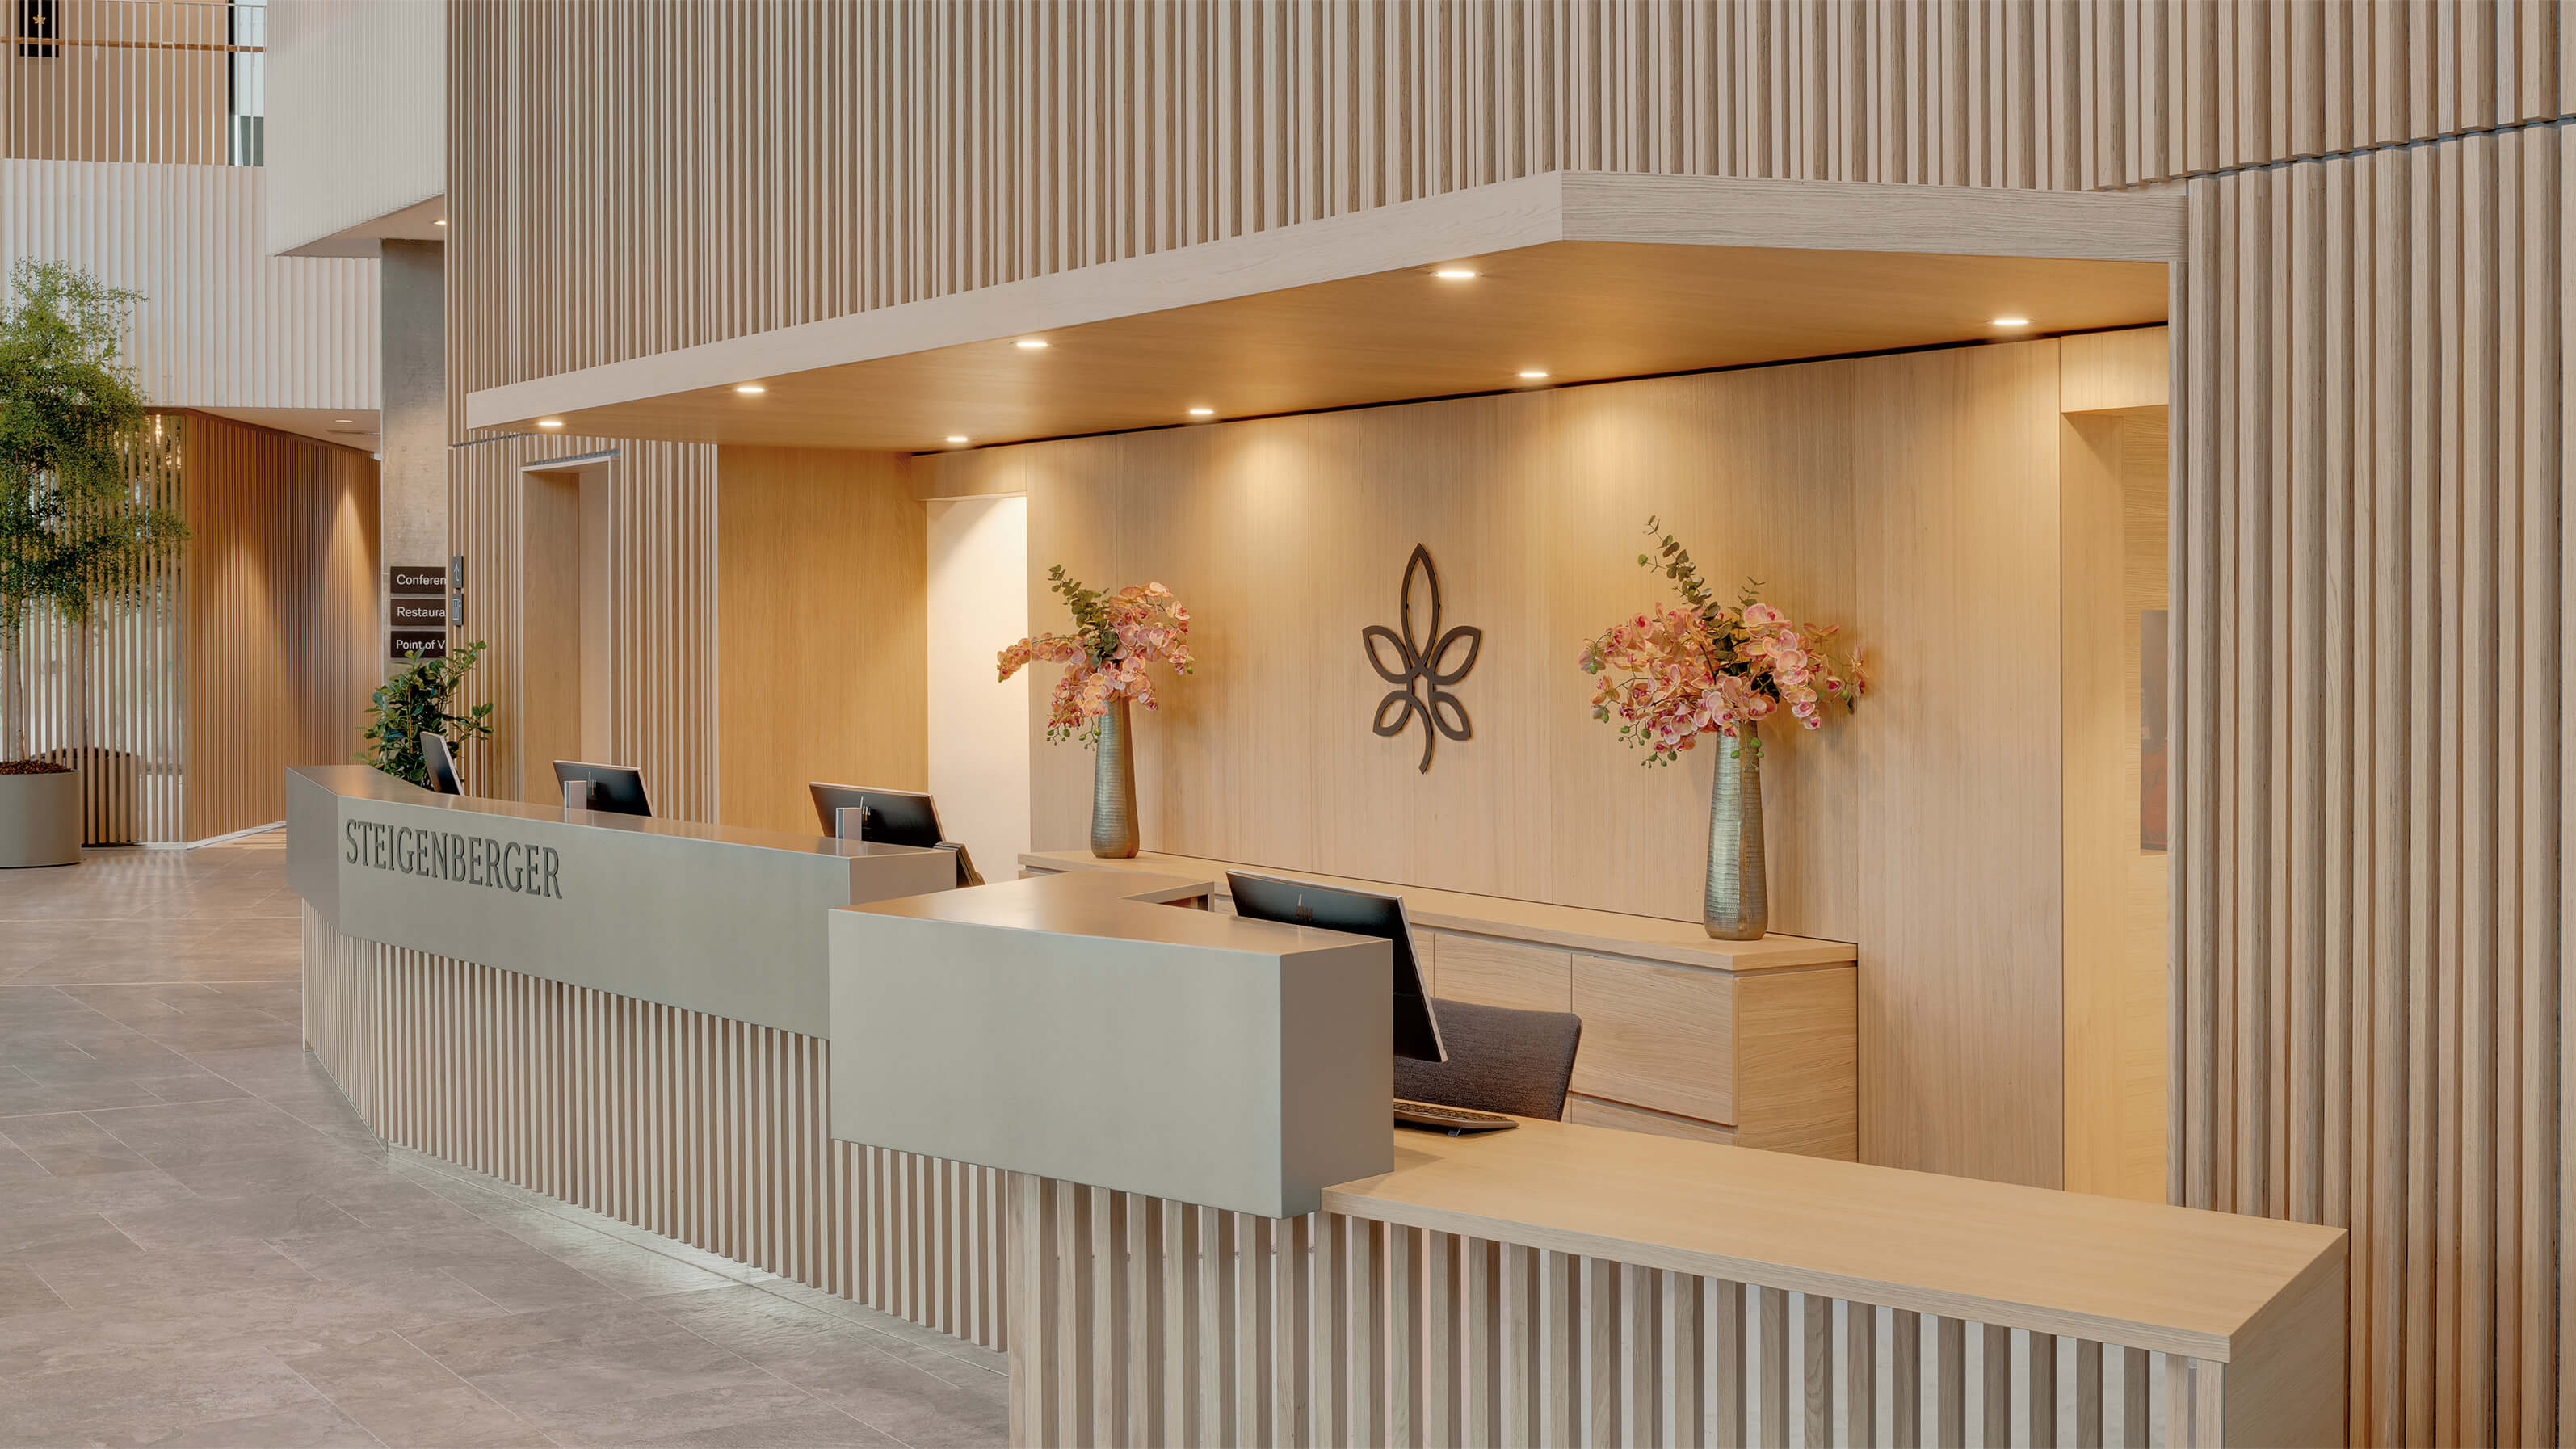 hotelausstattung-hoteleinrichtungen-bachhuber-Alsik-Sonderborg3